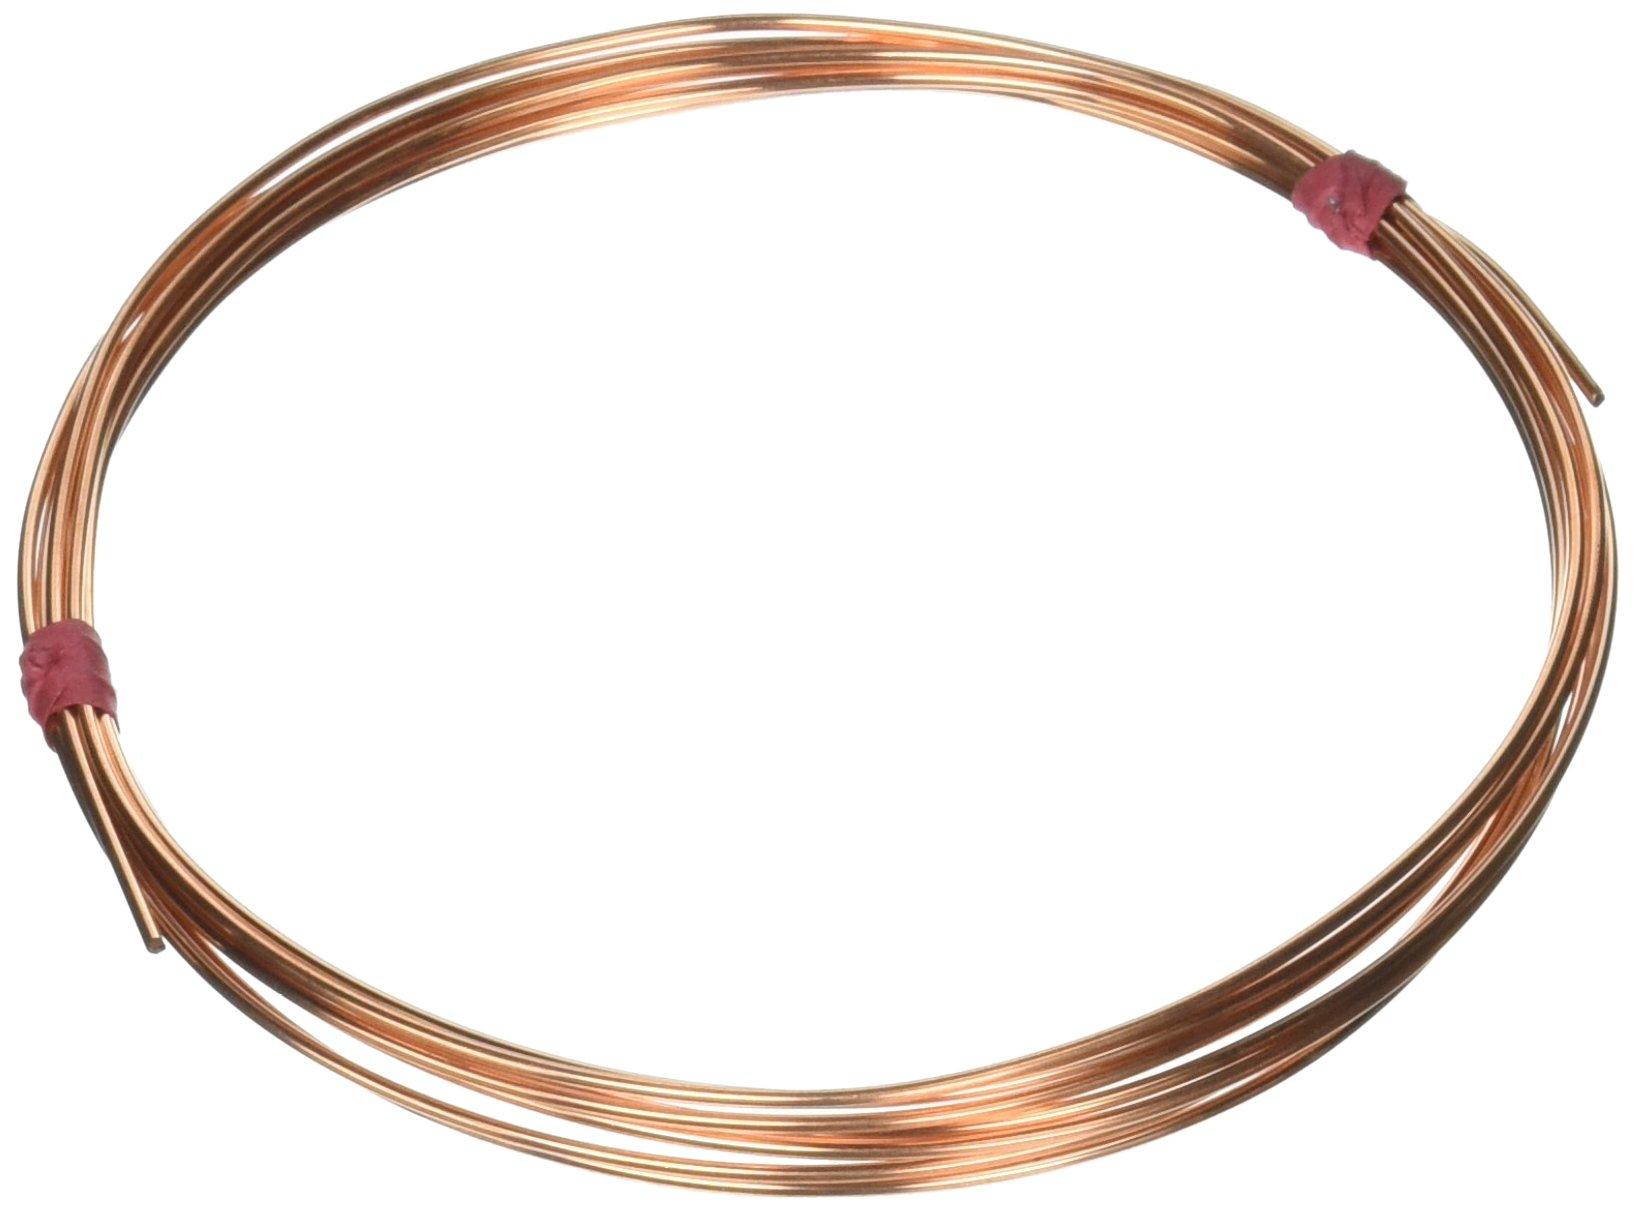 Amazon.com: Solid Copper Wire 16 Gauge Half Round Dead Soft (1 Oz ...